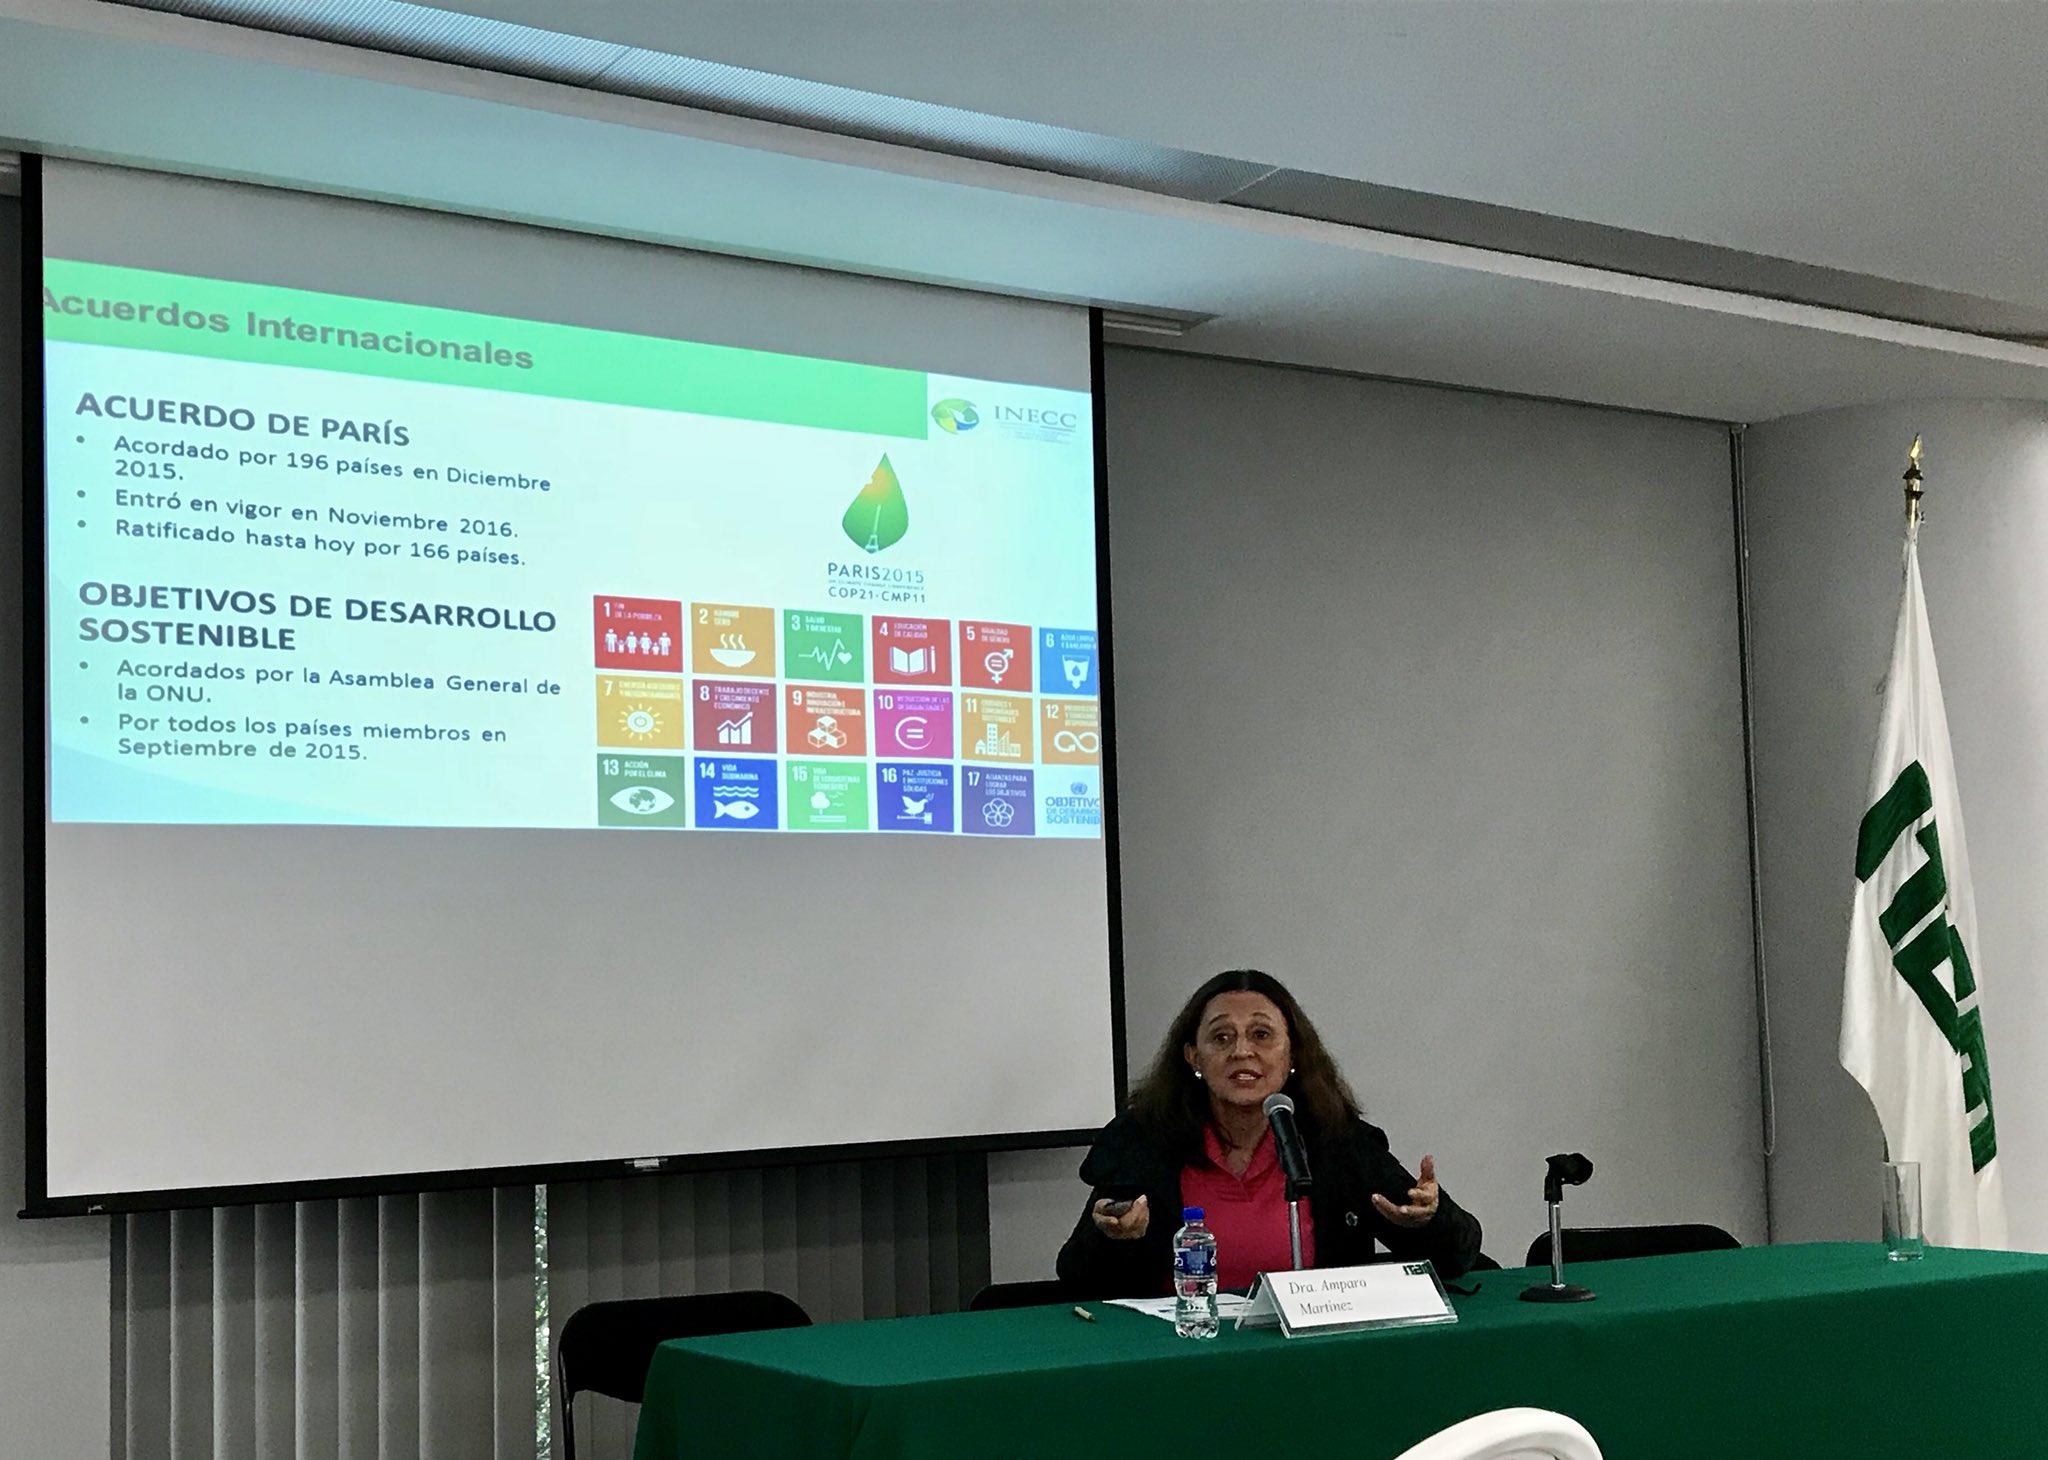 ODS para las metas de acción climática